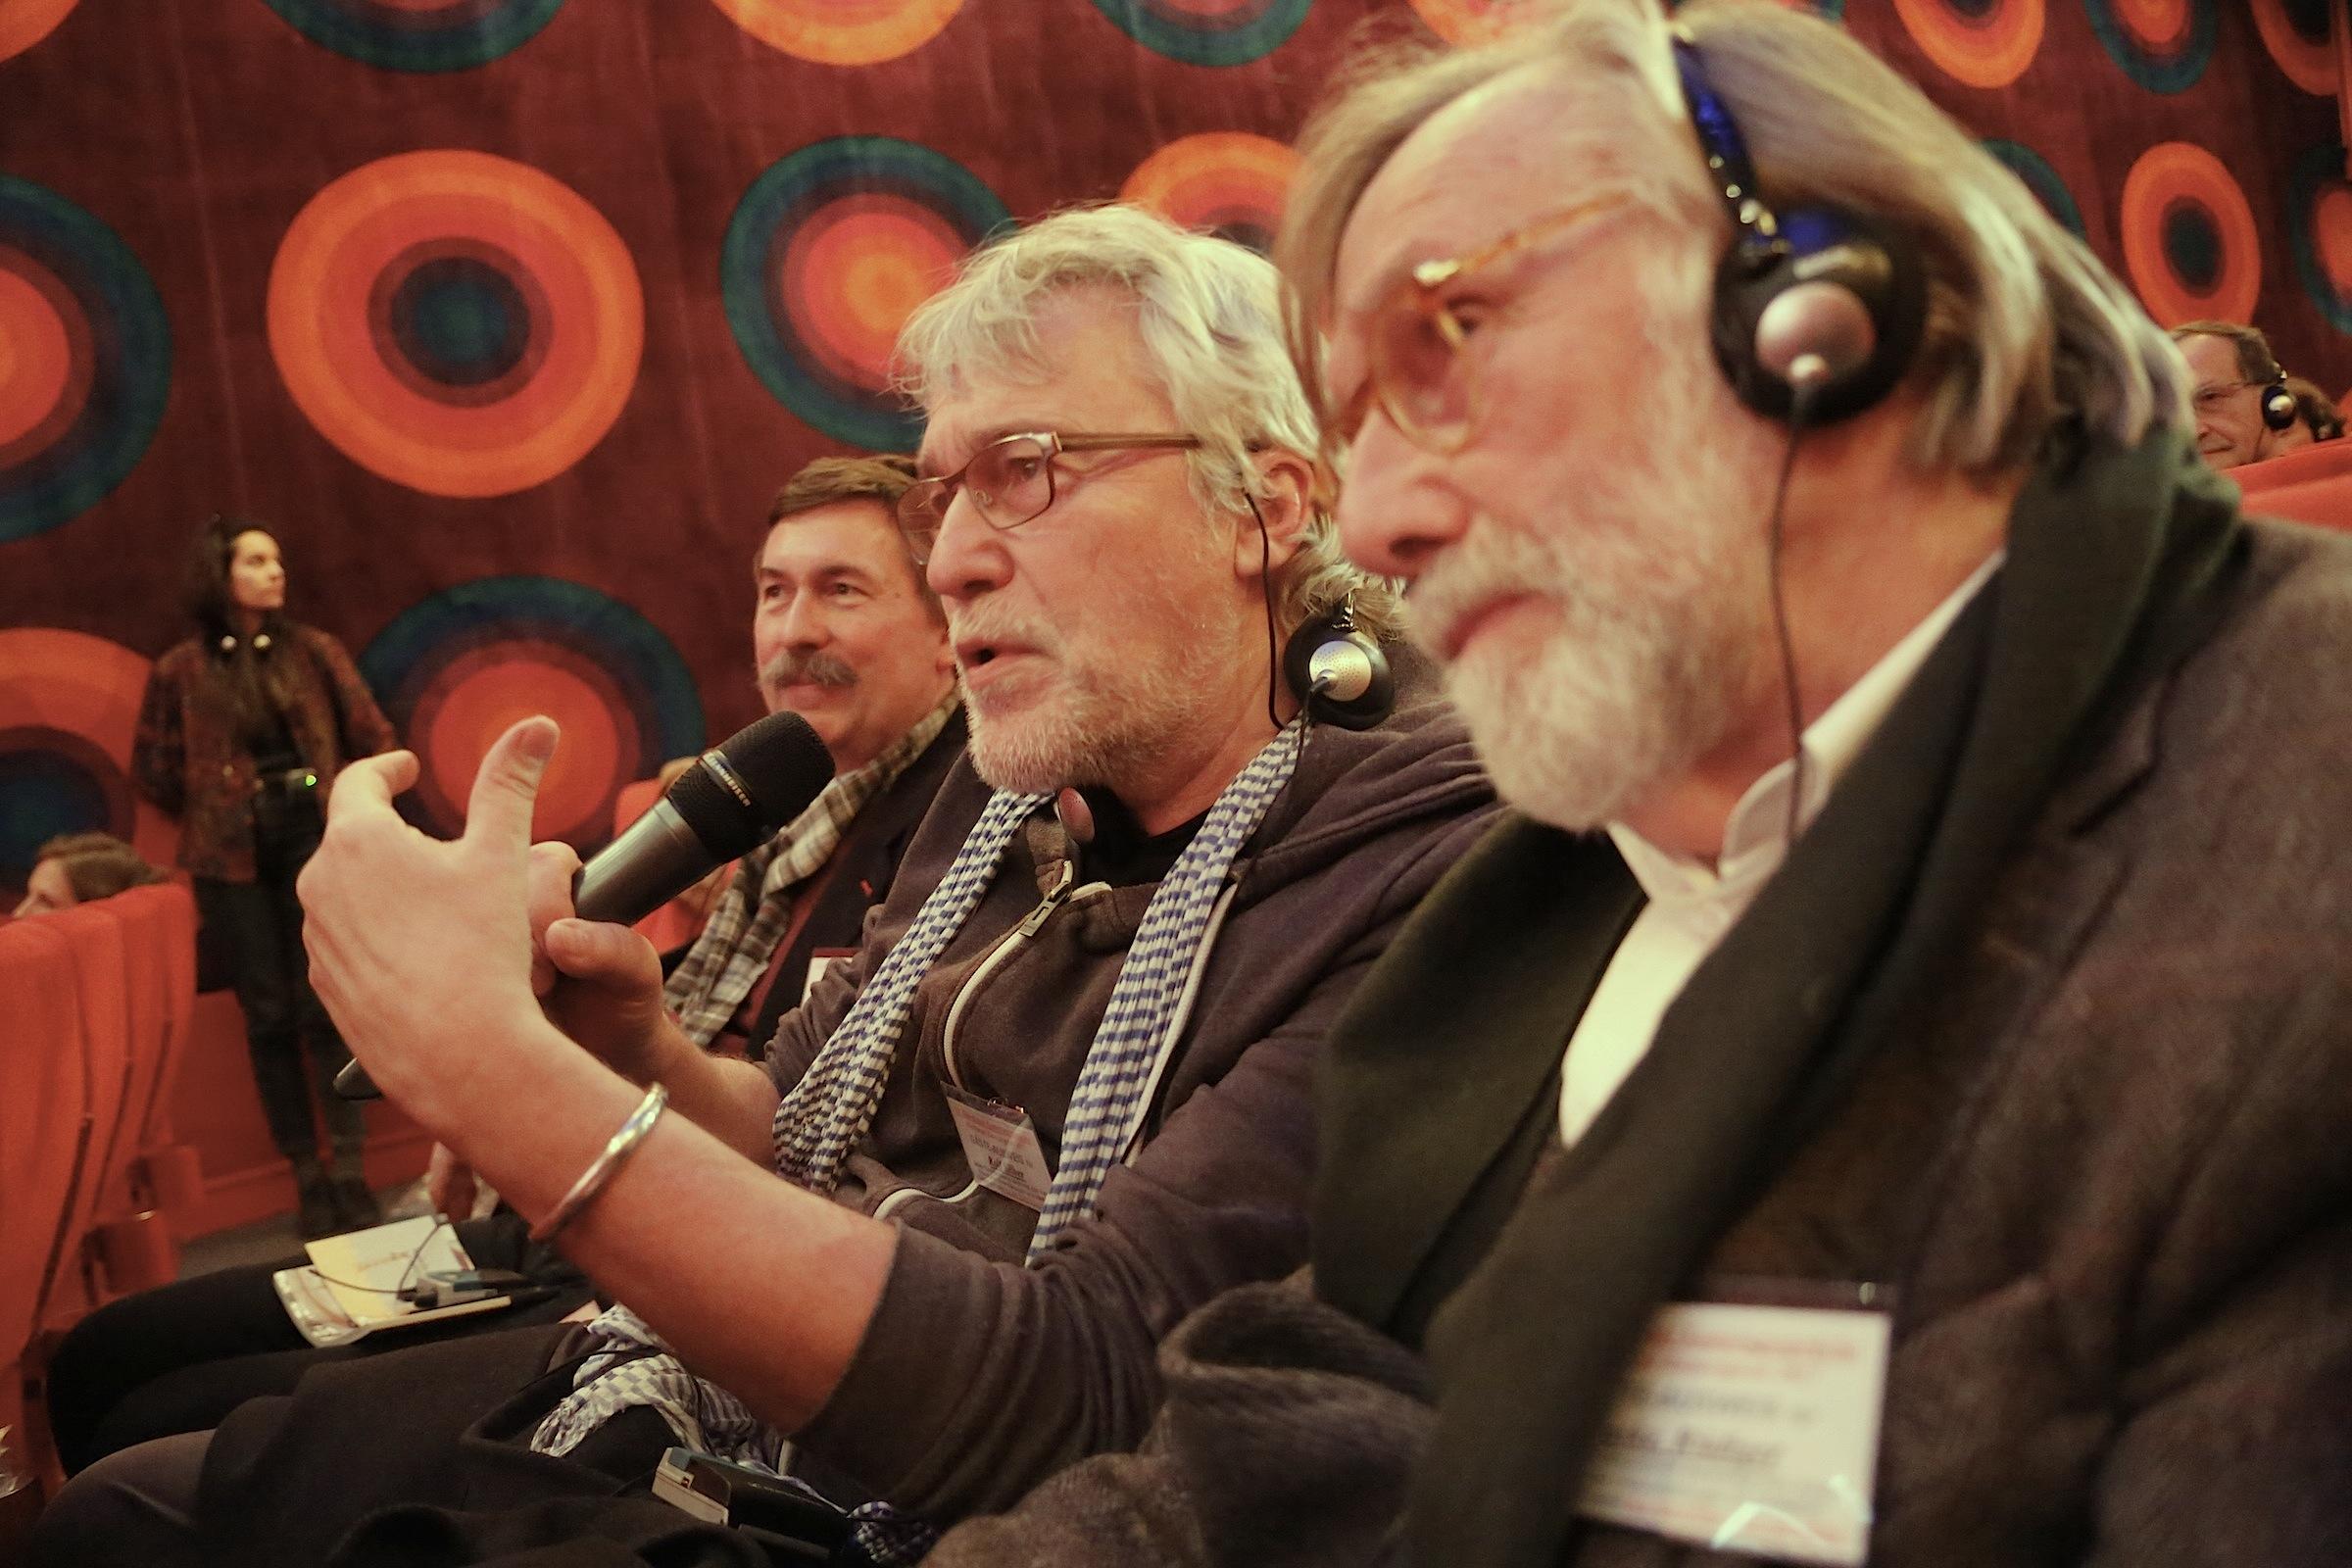 Michael Neubauer, Rolf Silber und Rüdiger Laske (v.l.n.r.) © Achim Friederich